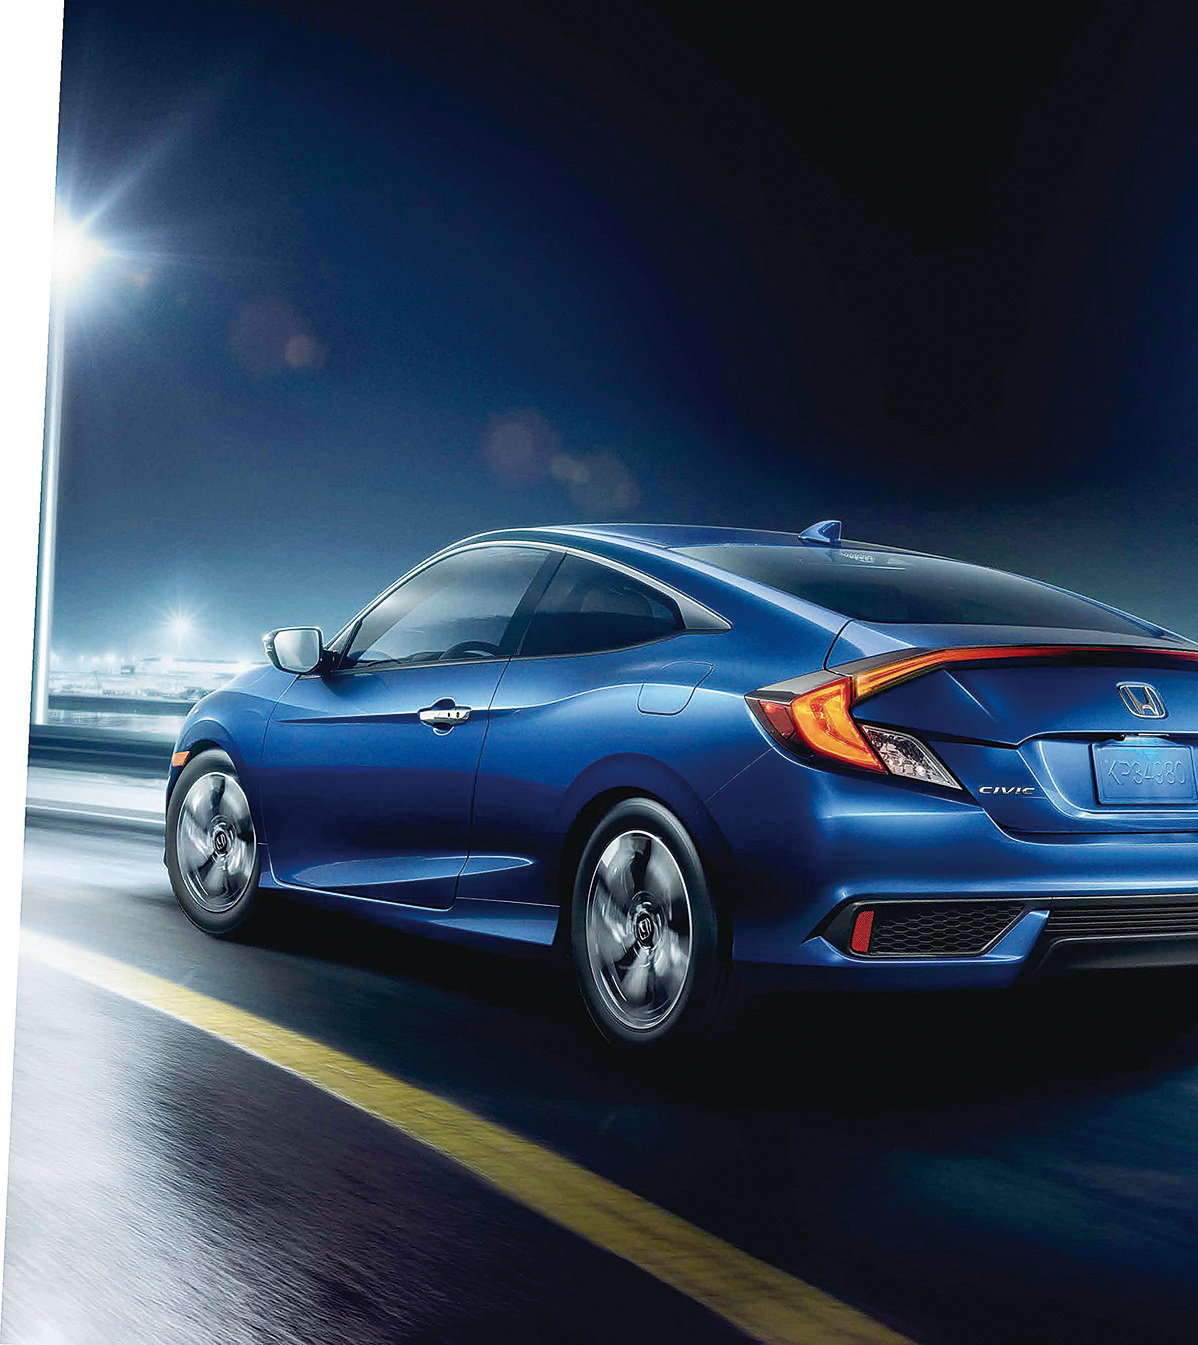 Civic Coupe提供金屬藍,鮮豔的色彩讓人眼前一亮。